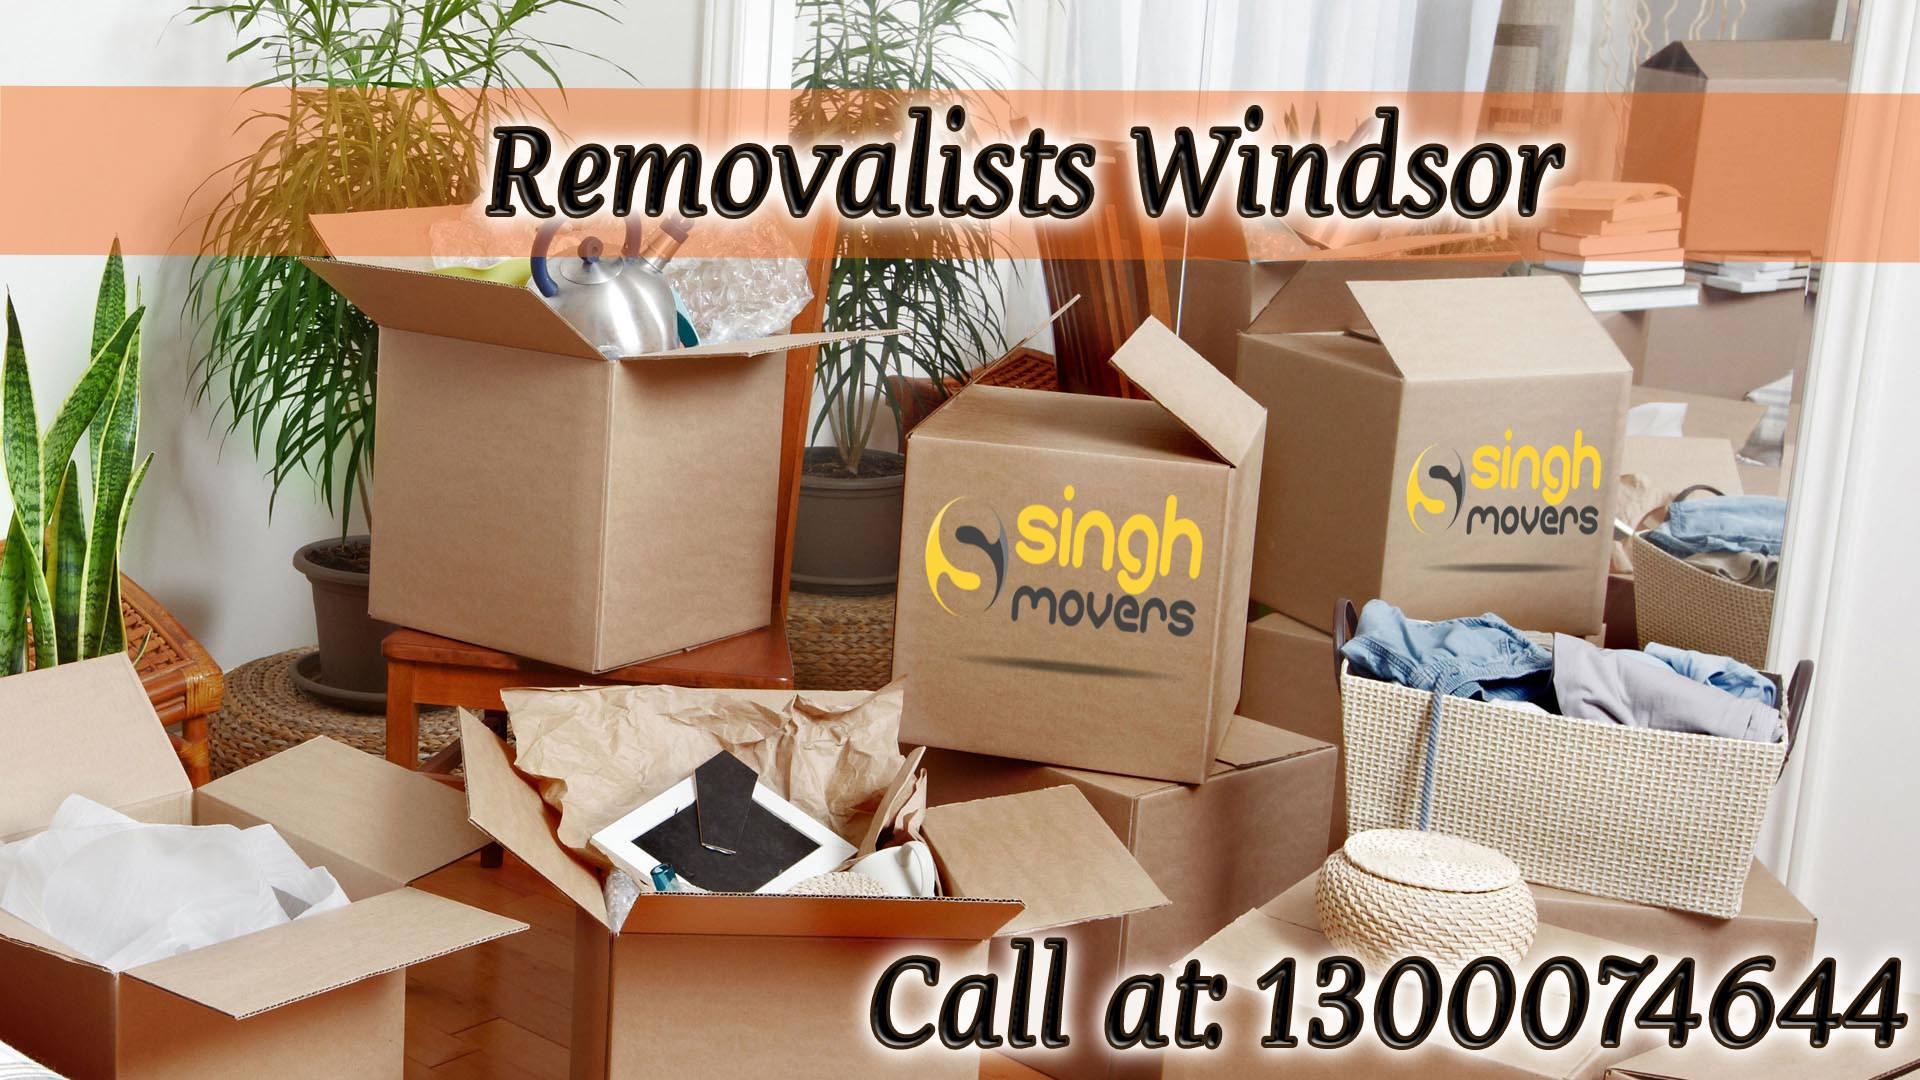 Removalists Windsor